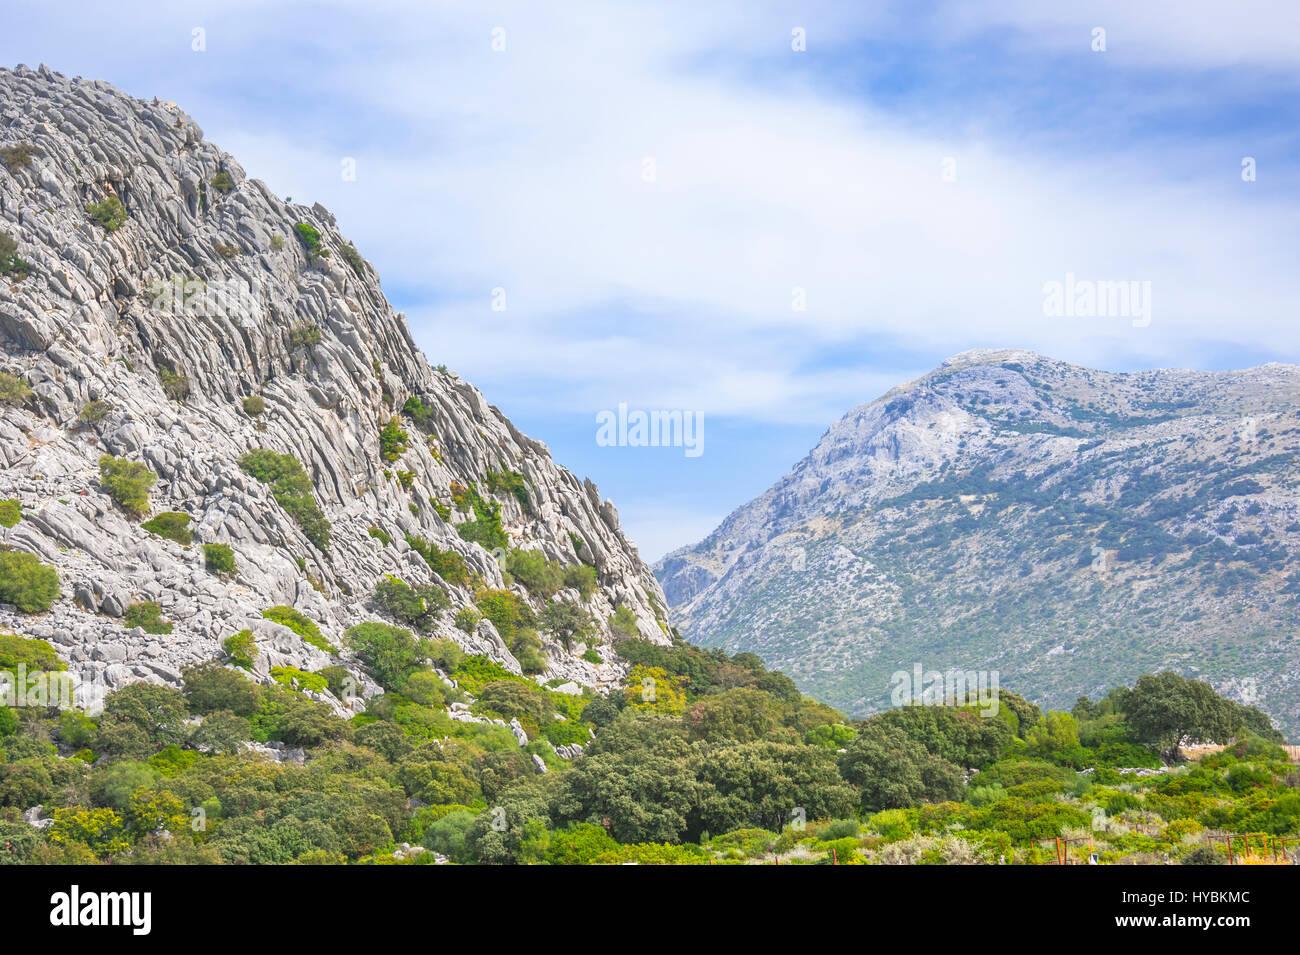 Mountains of the Ribera de Gaidovar in the mountain area of Ronda, Sierra de Grazalema, Andalusia, Spain - Stock Image